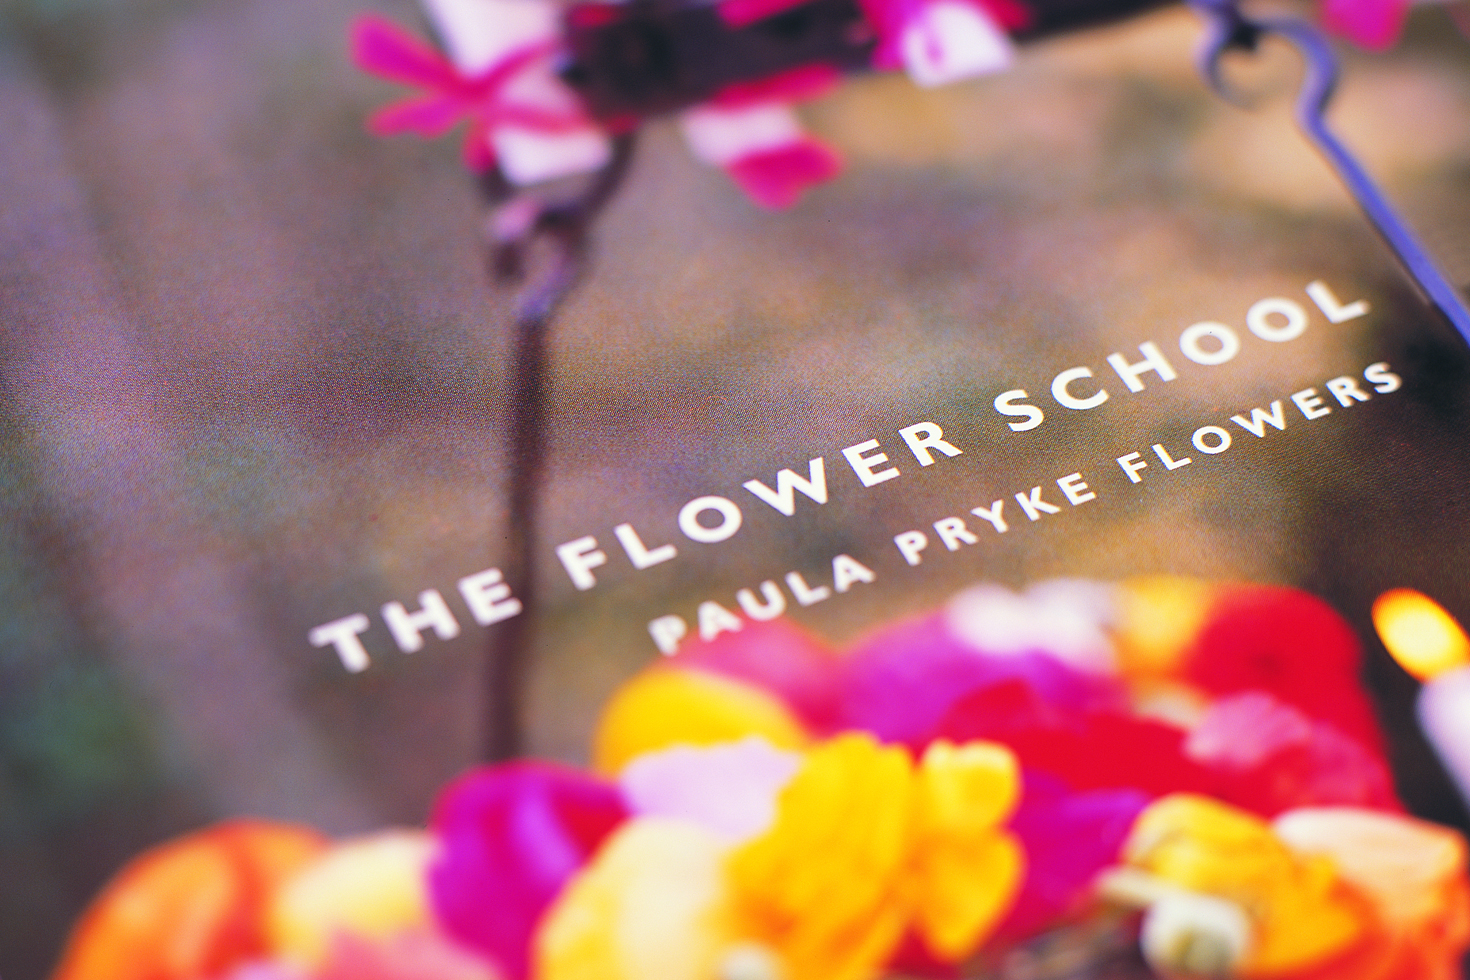 Paula Pryke Flowers window